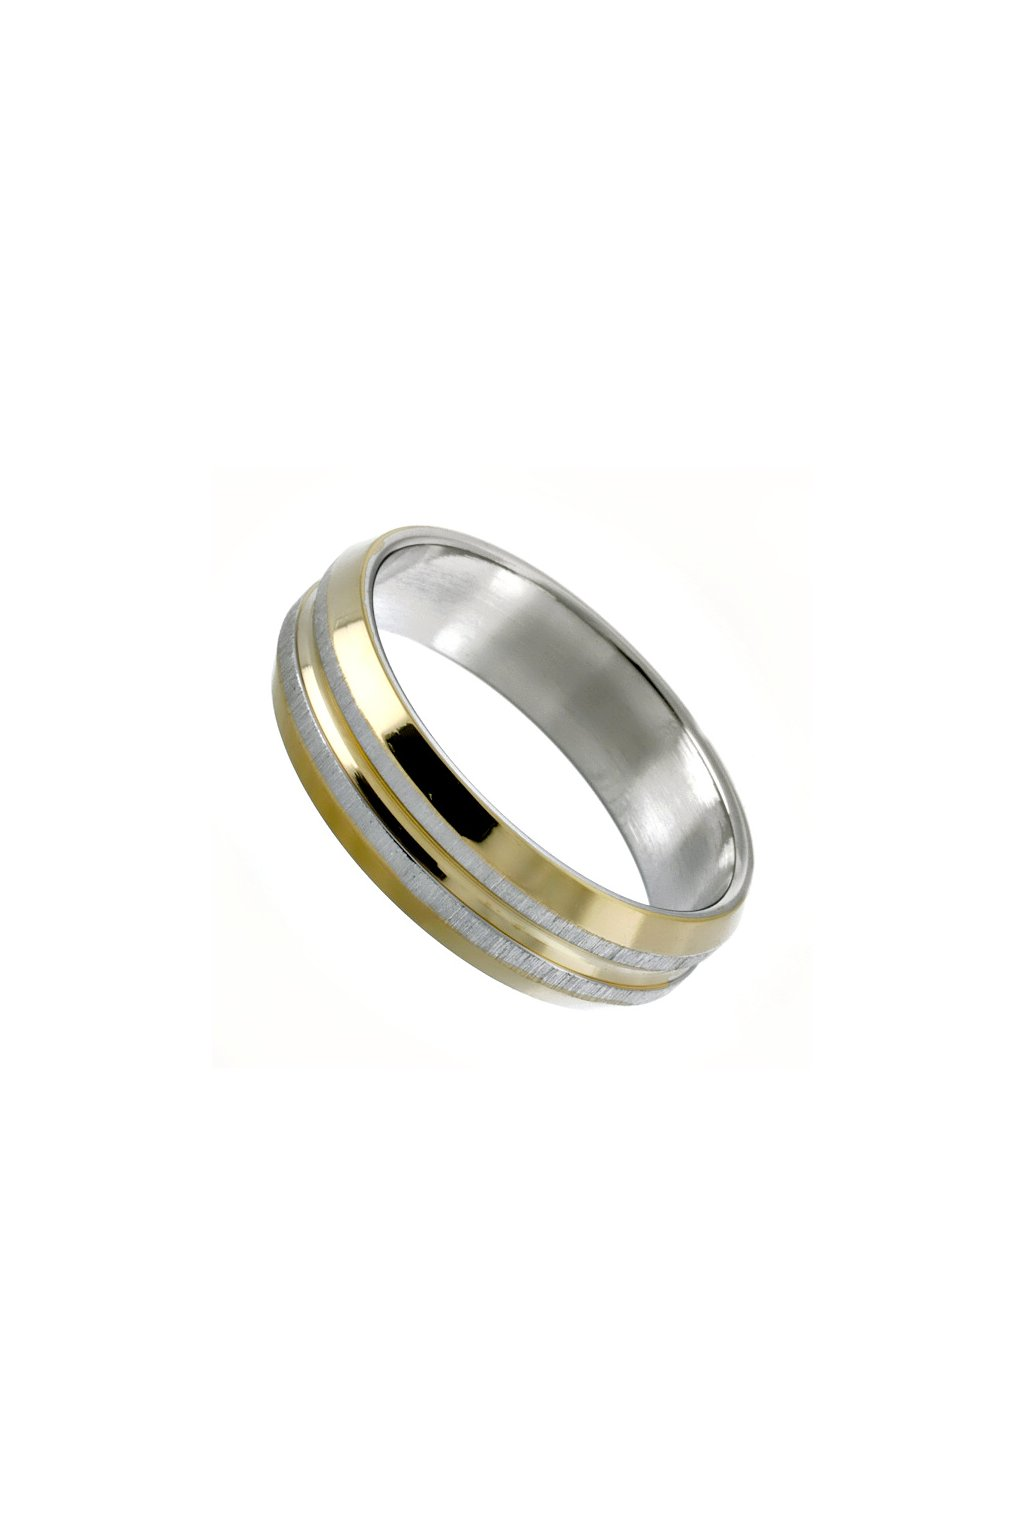 Skalimar Prsten z chirurgické oceli POZLACENÝ KROUŽEK S MATNÝM BRUSEM 212120